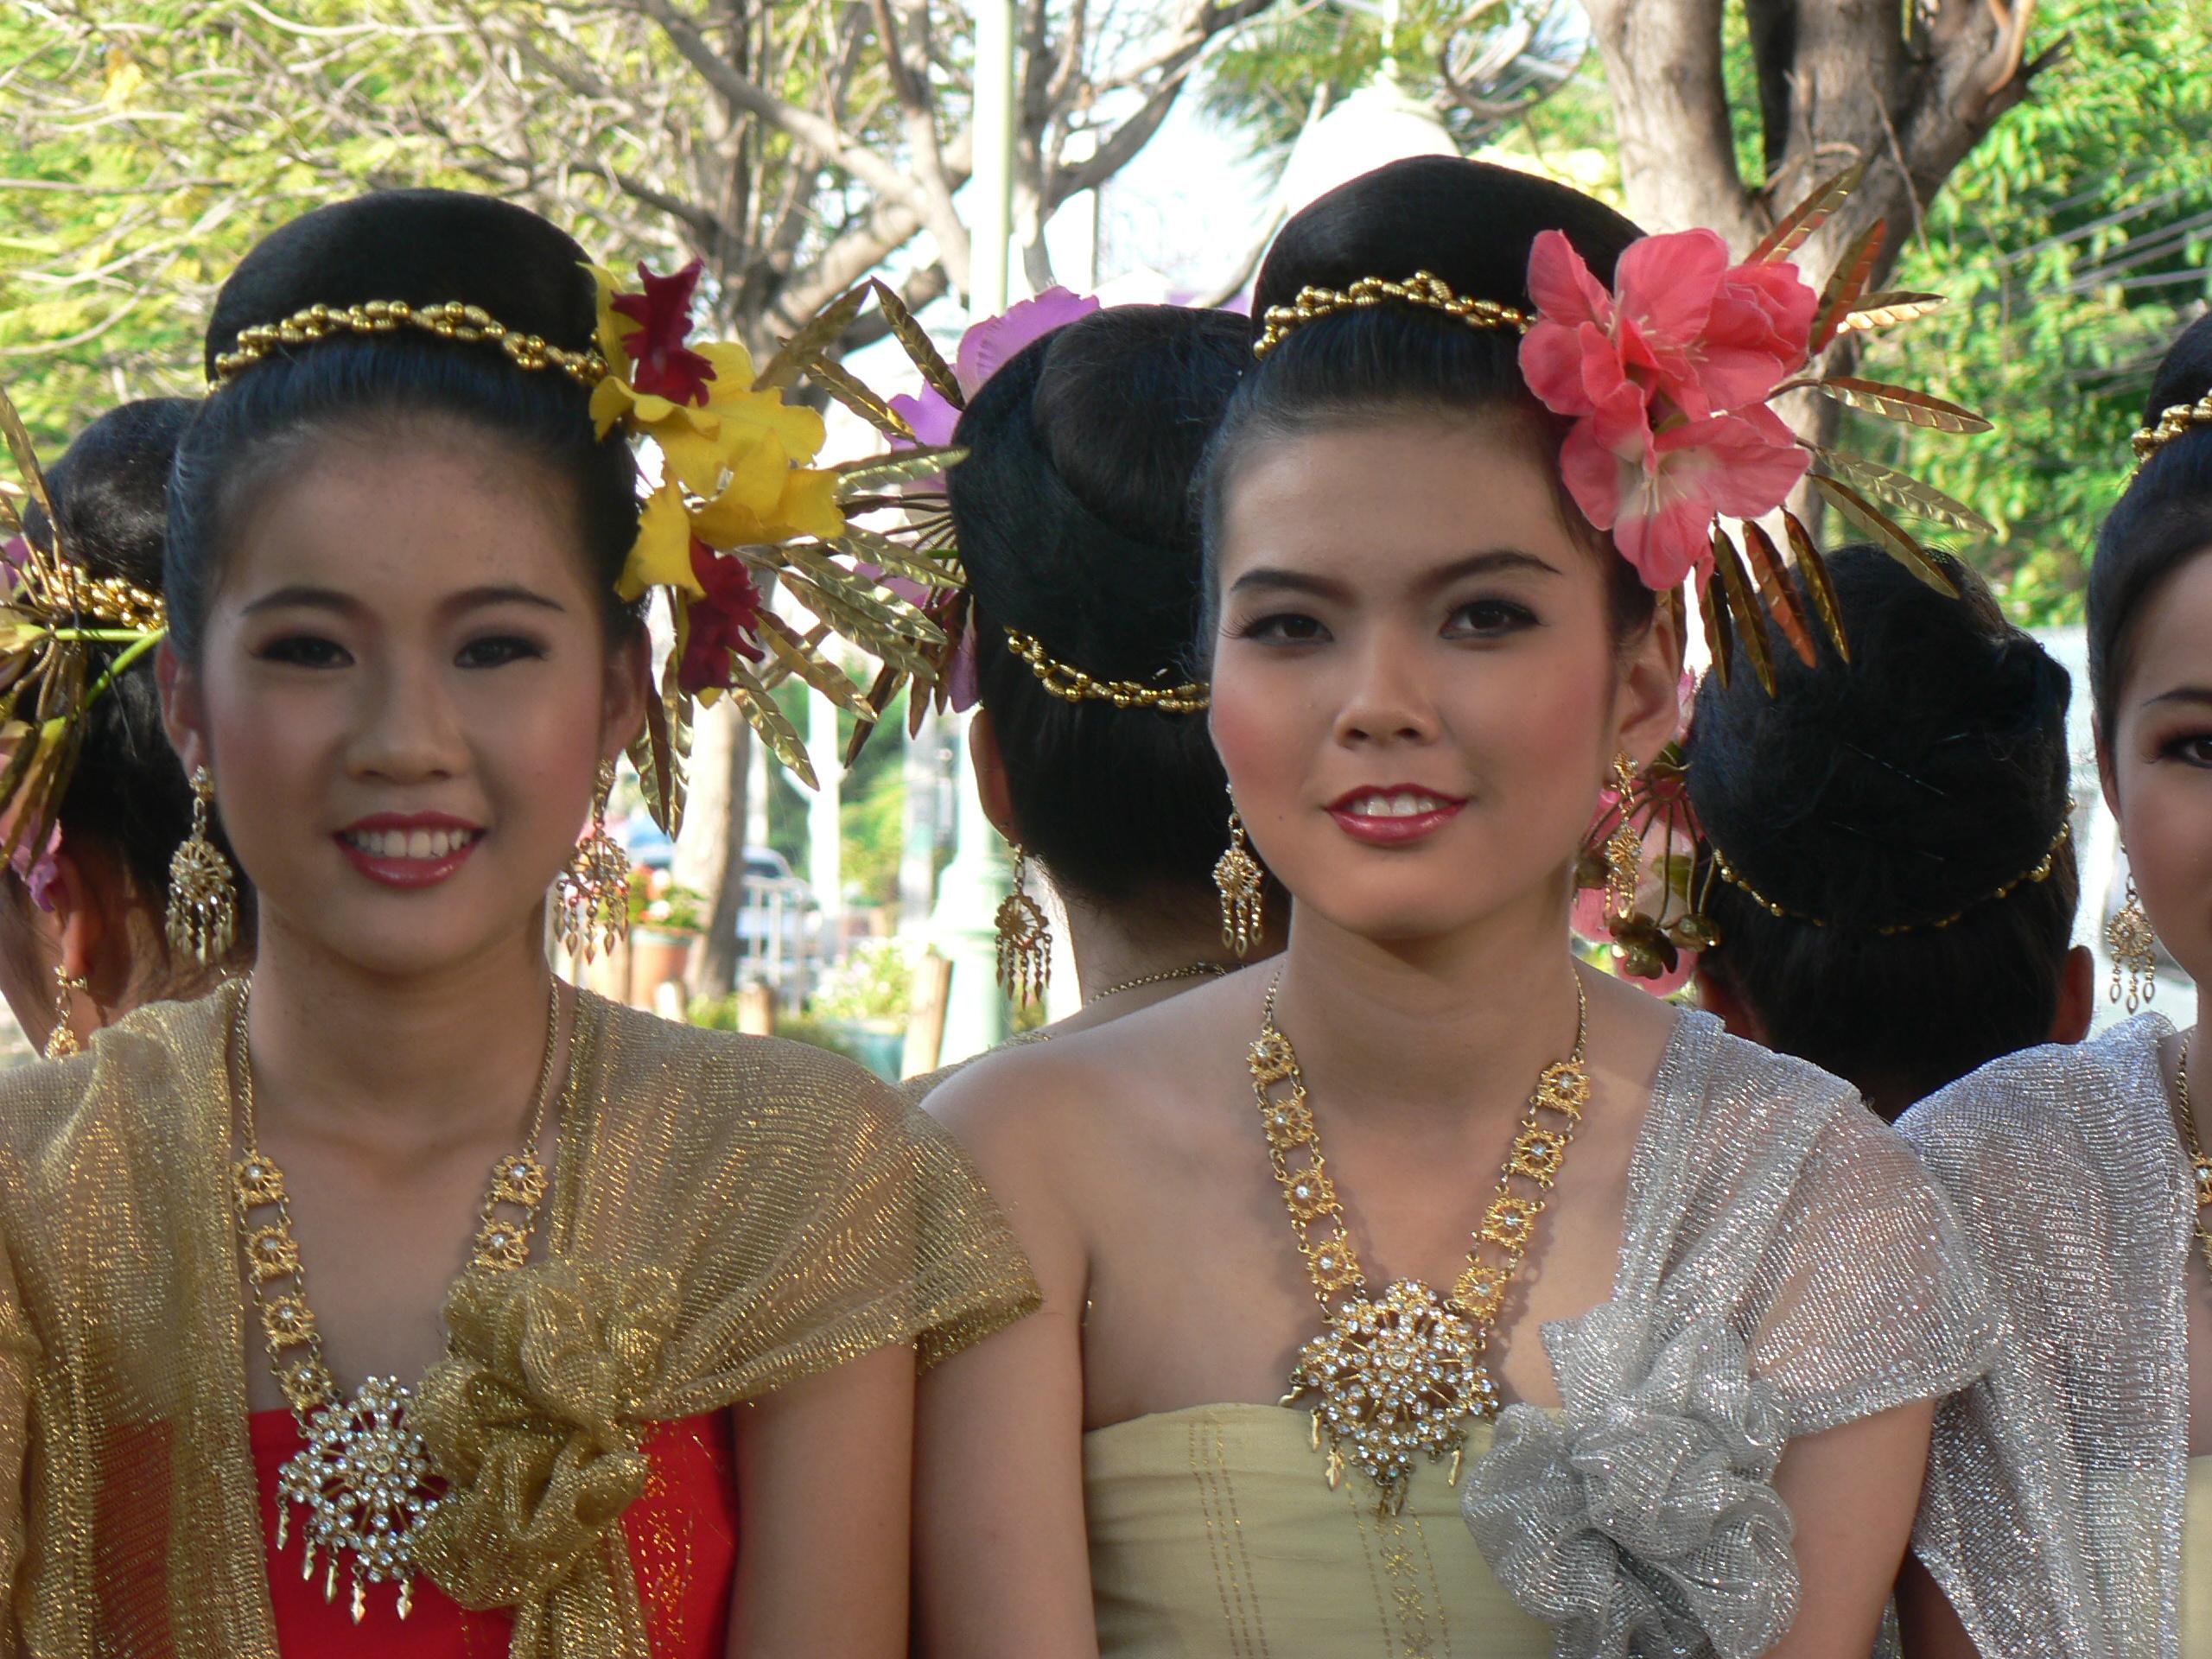 Chiang mai dating free